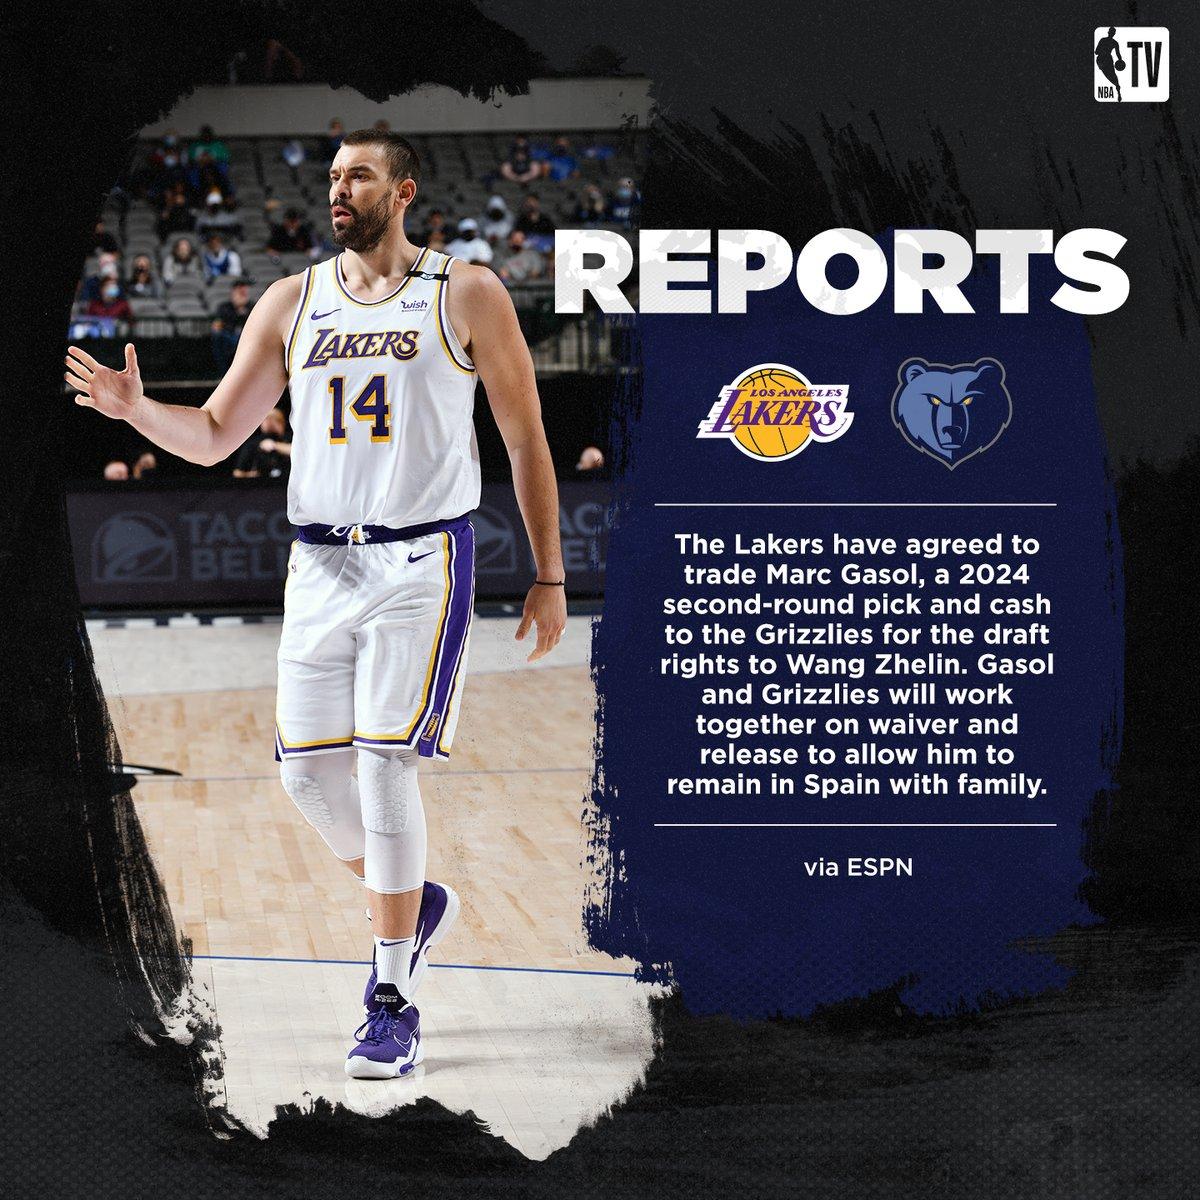 @NBATV's photo on Grizzlies